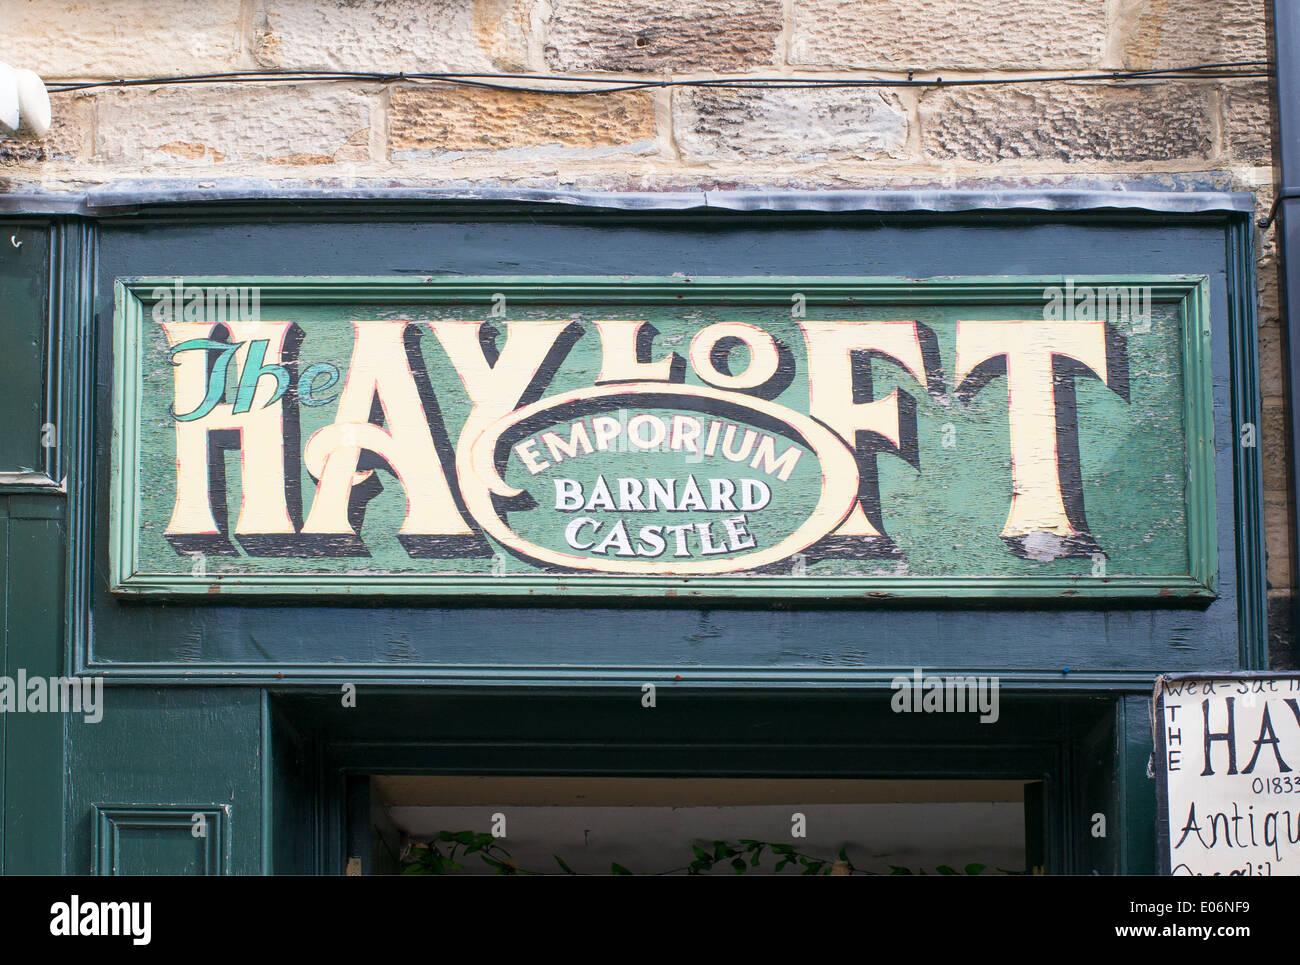 Hayloft Emporium Sign Over Antique Shop Door Barnard Castle North East  England UK